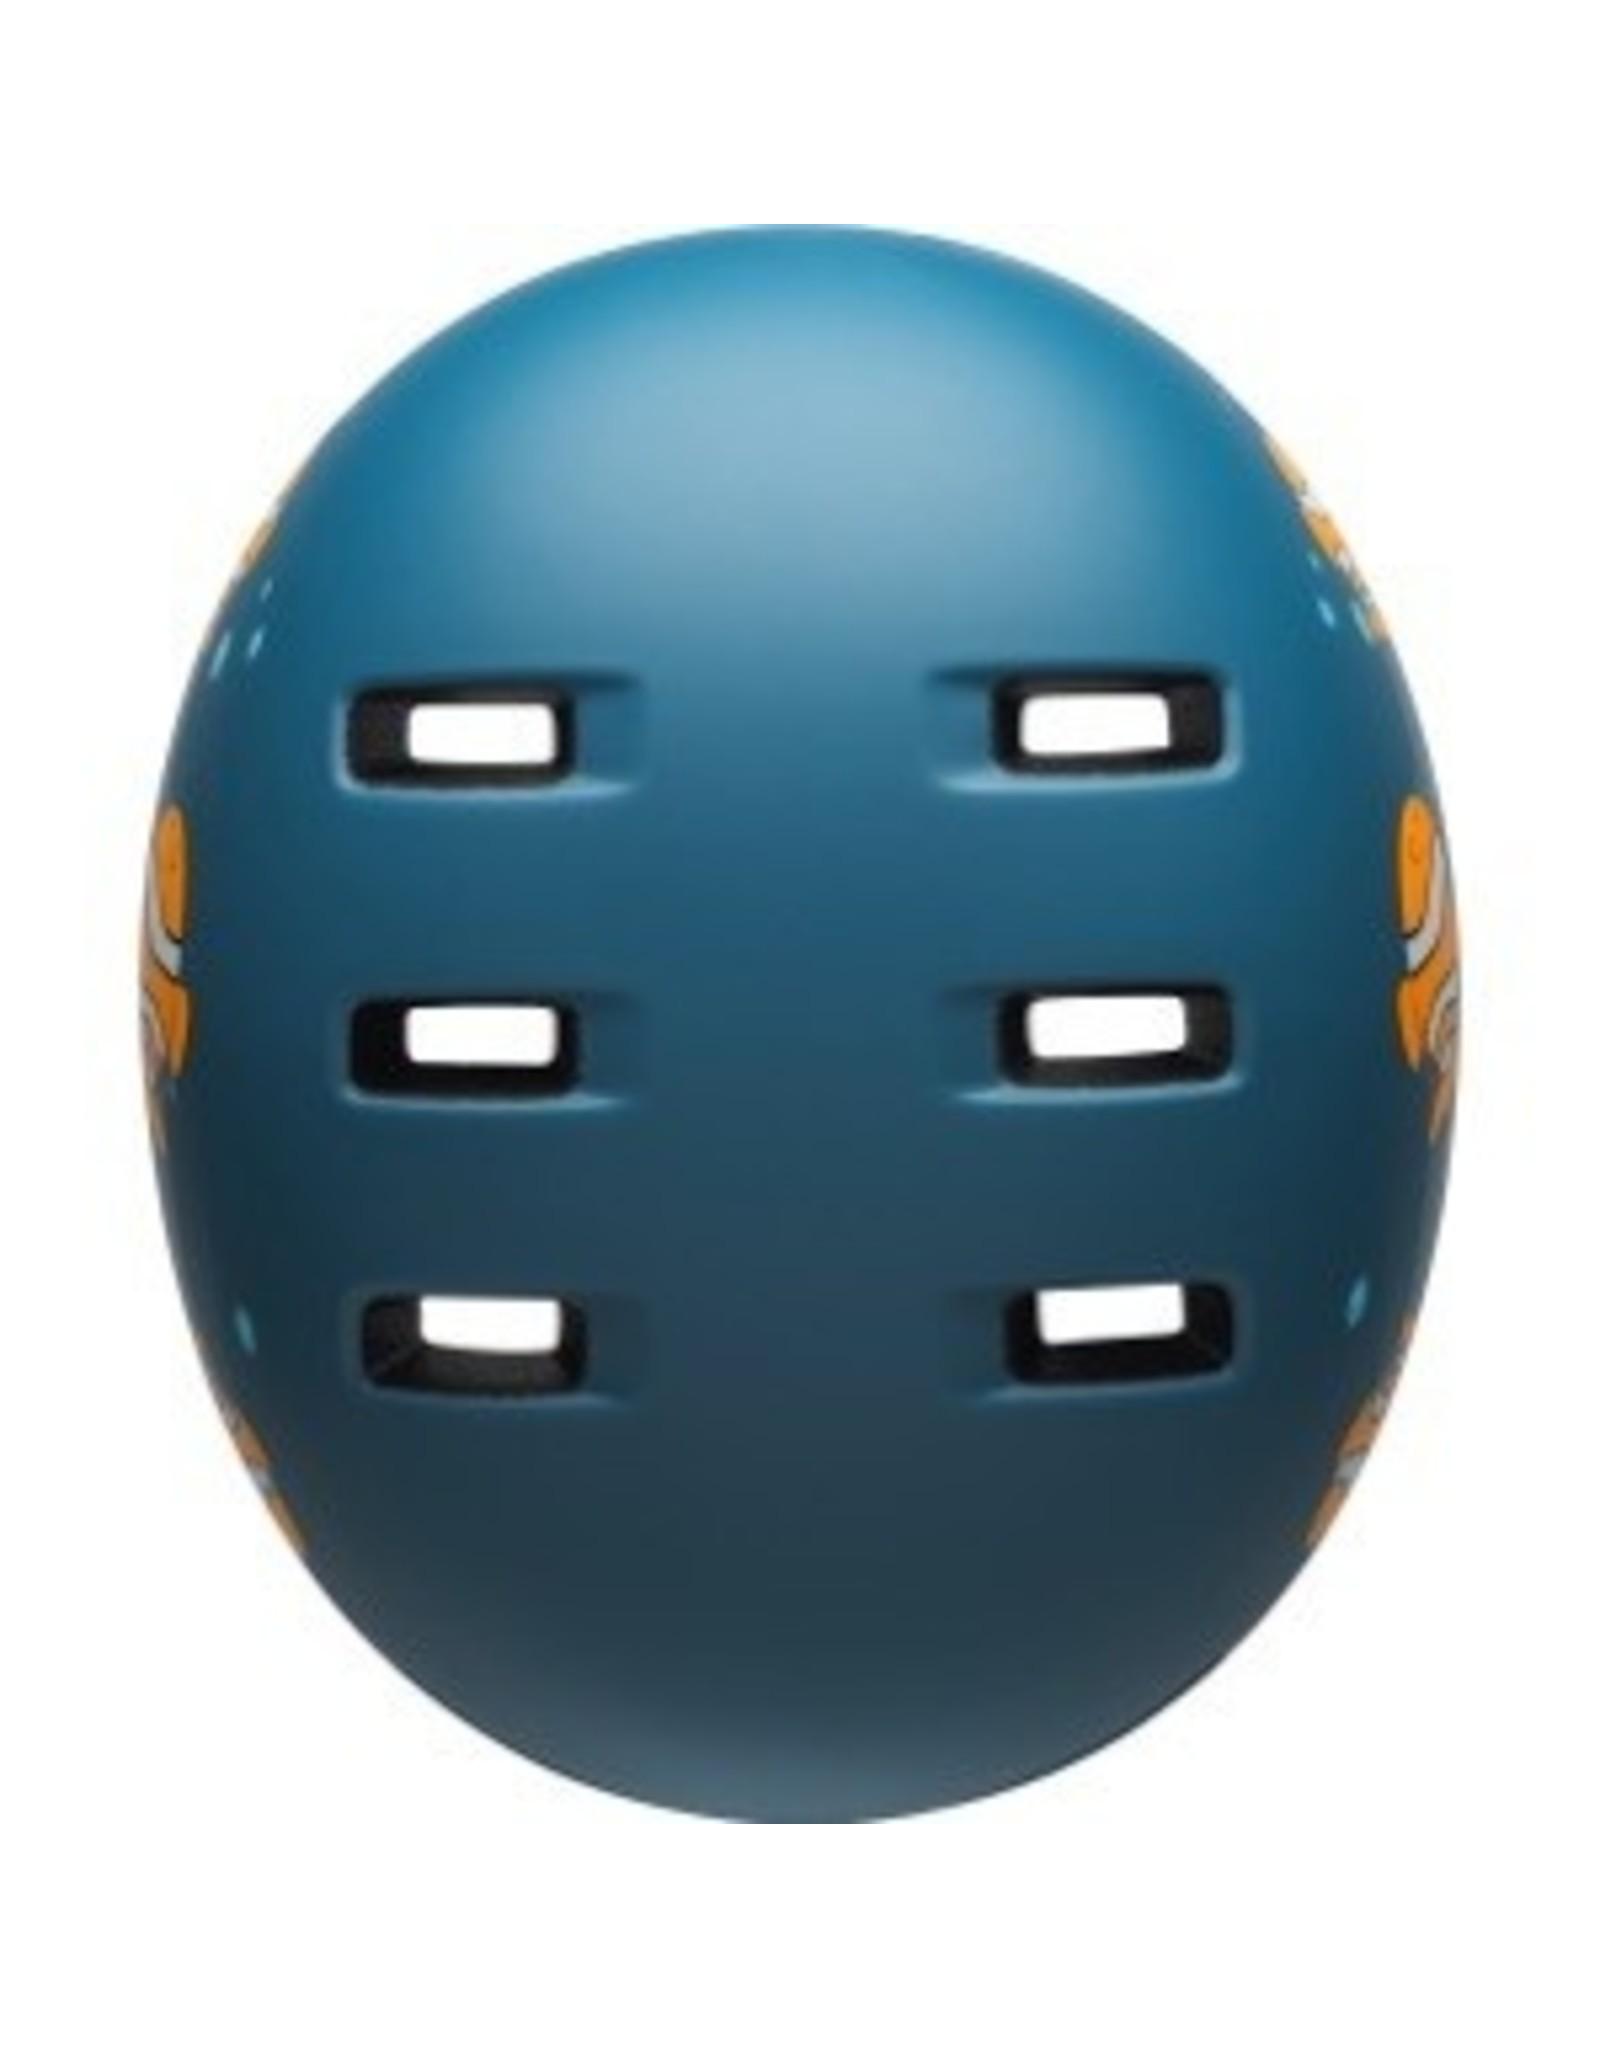 Bell Lil Ripper Youth Bike Helmet - Clown Fish Matte Grey-Blue - UC (47-54 cm)